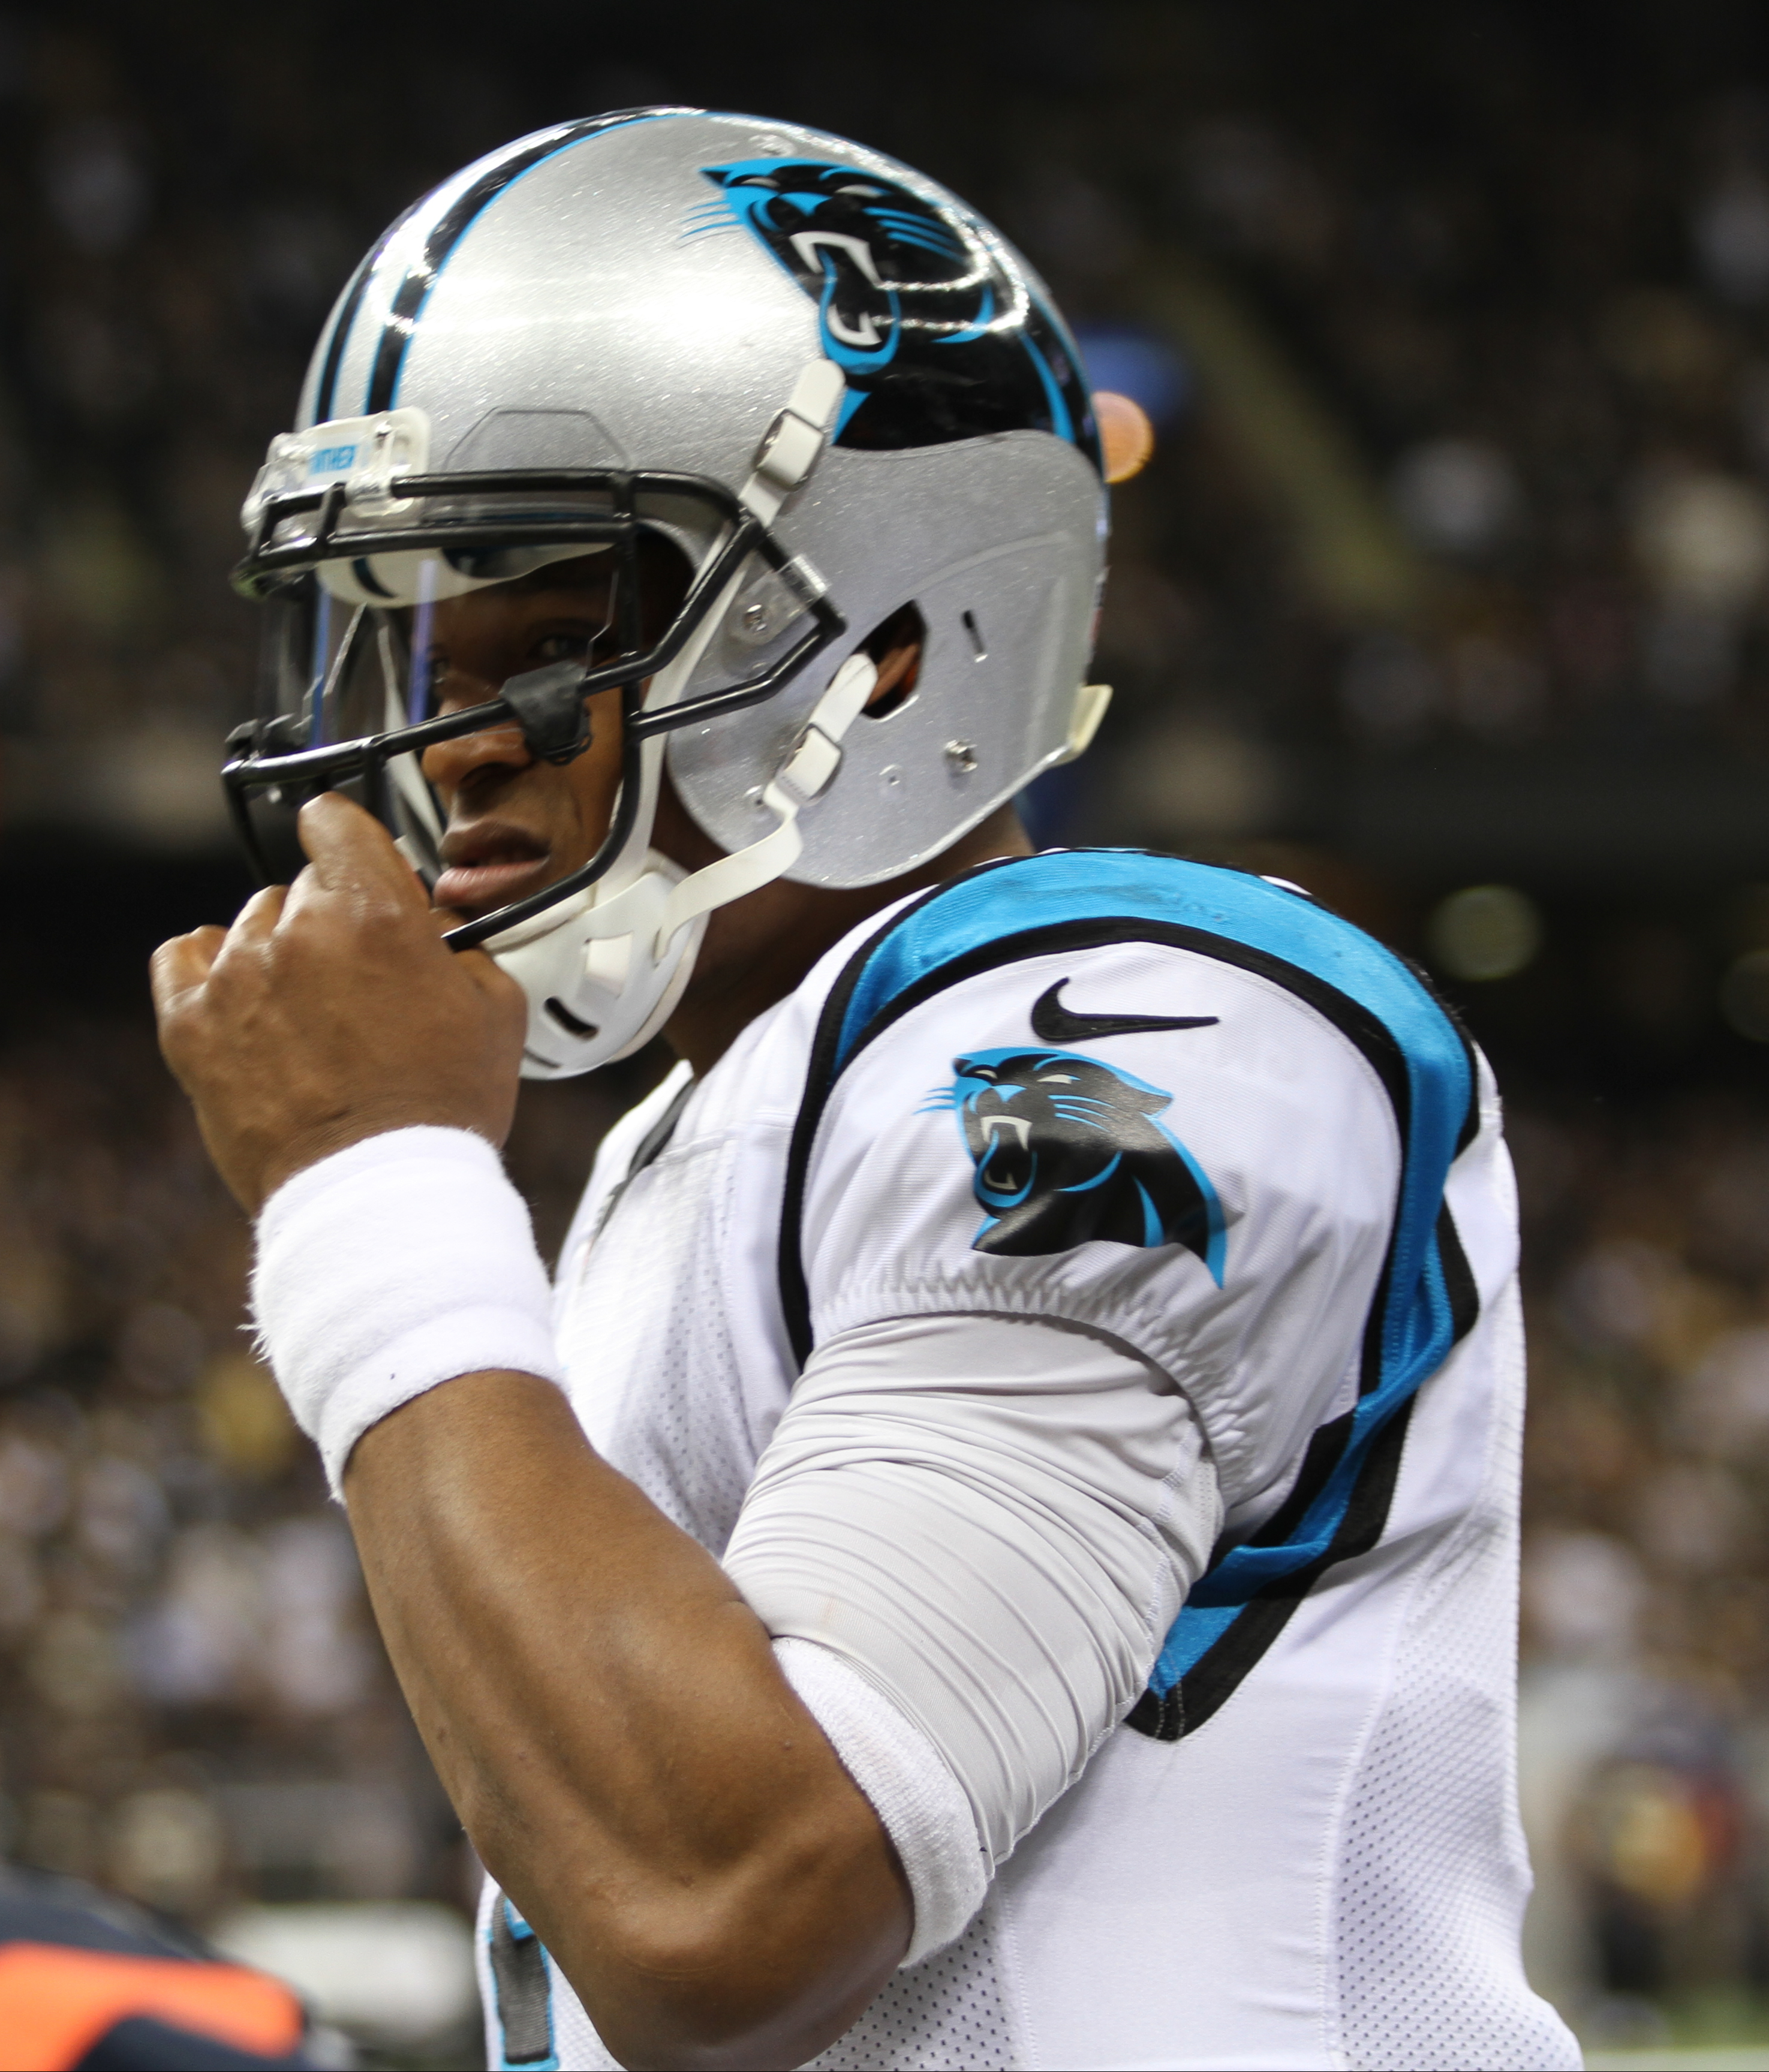 Saints Newton - jpg Vs File Commons Wikimedia cam 2015-12-06 Panthers